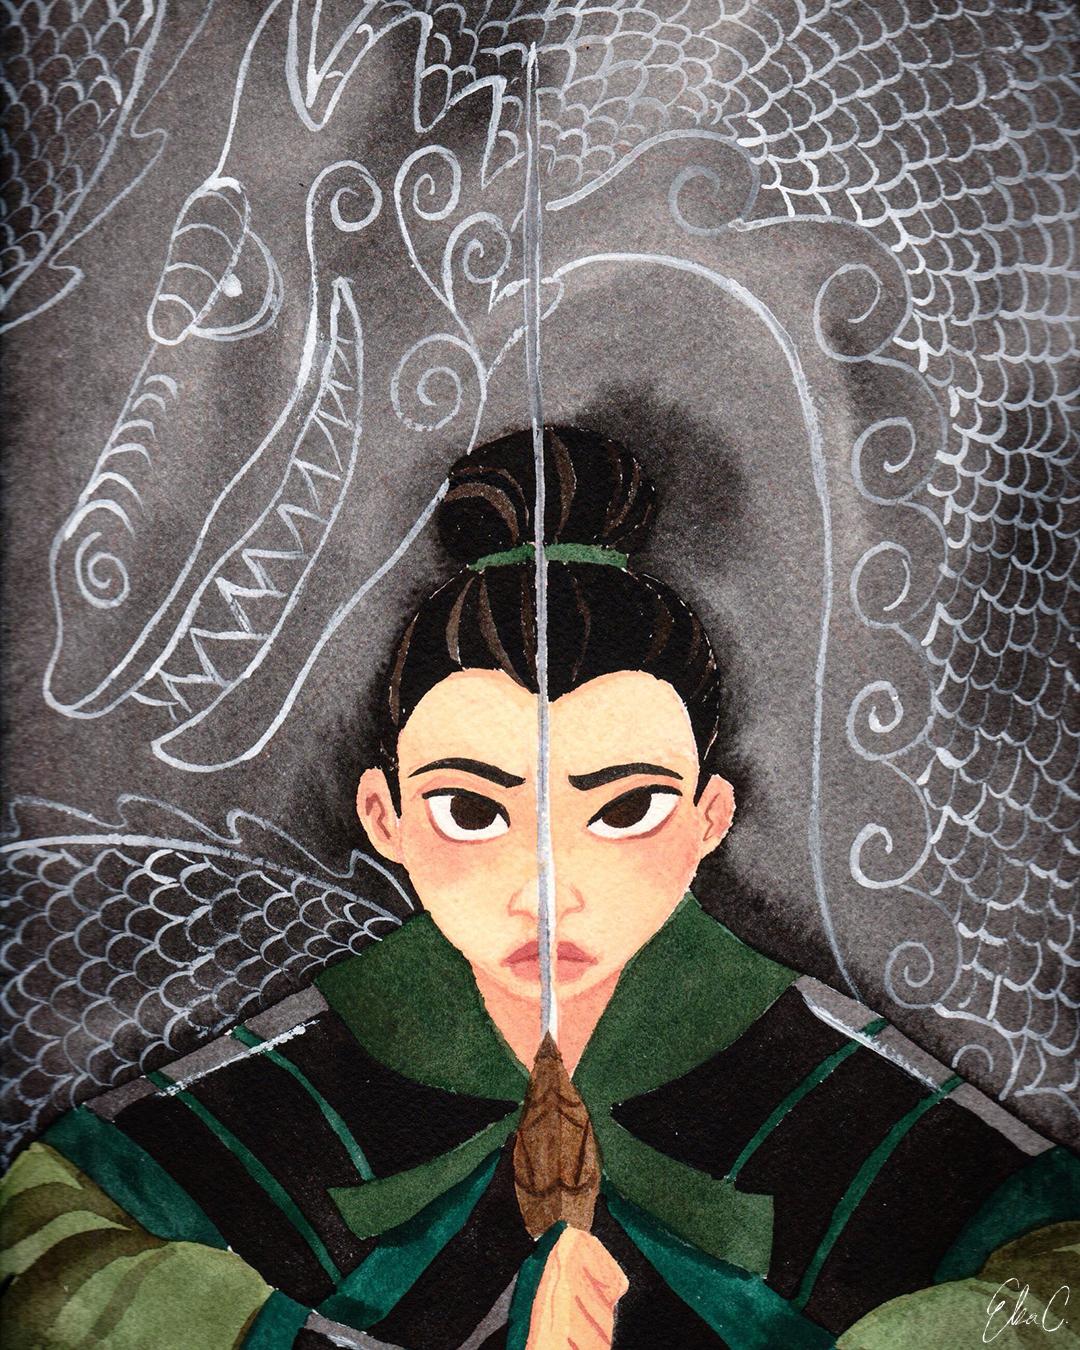 GirlsclubAsia-Illustrator-Elsa-Chang-4